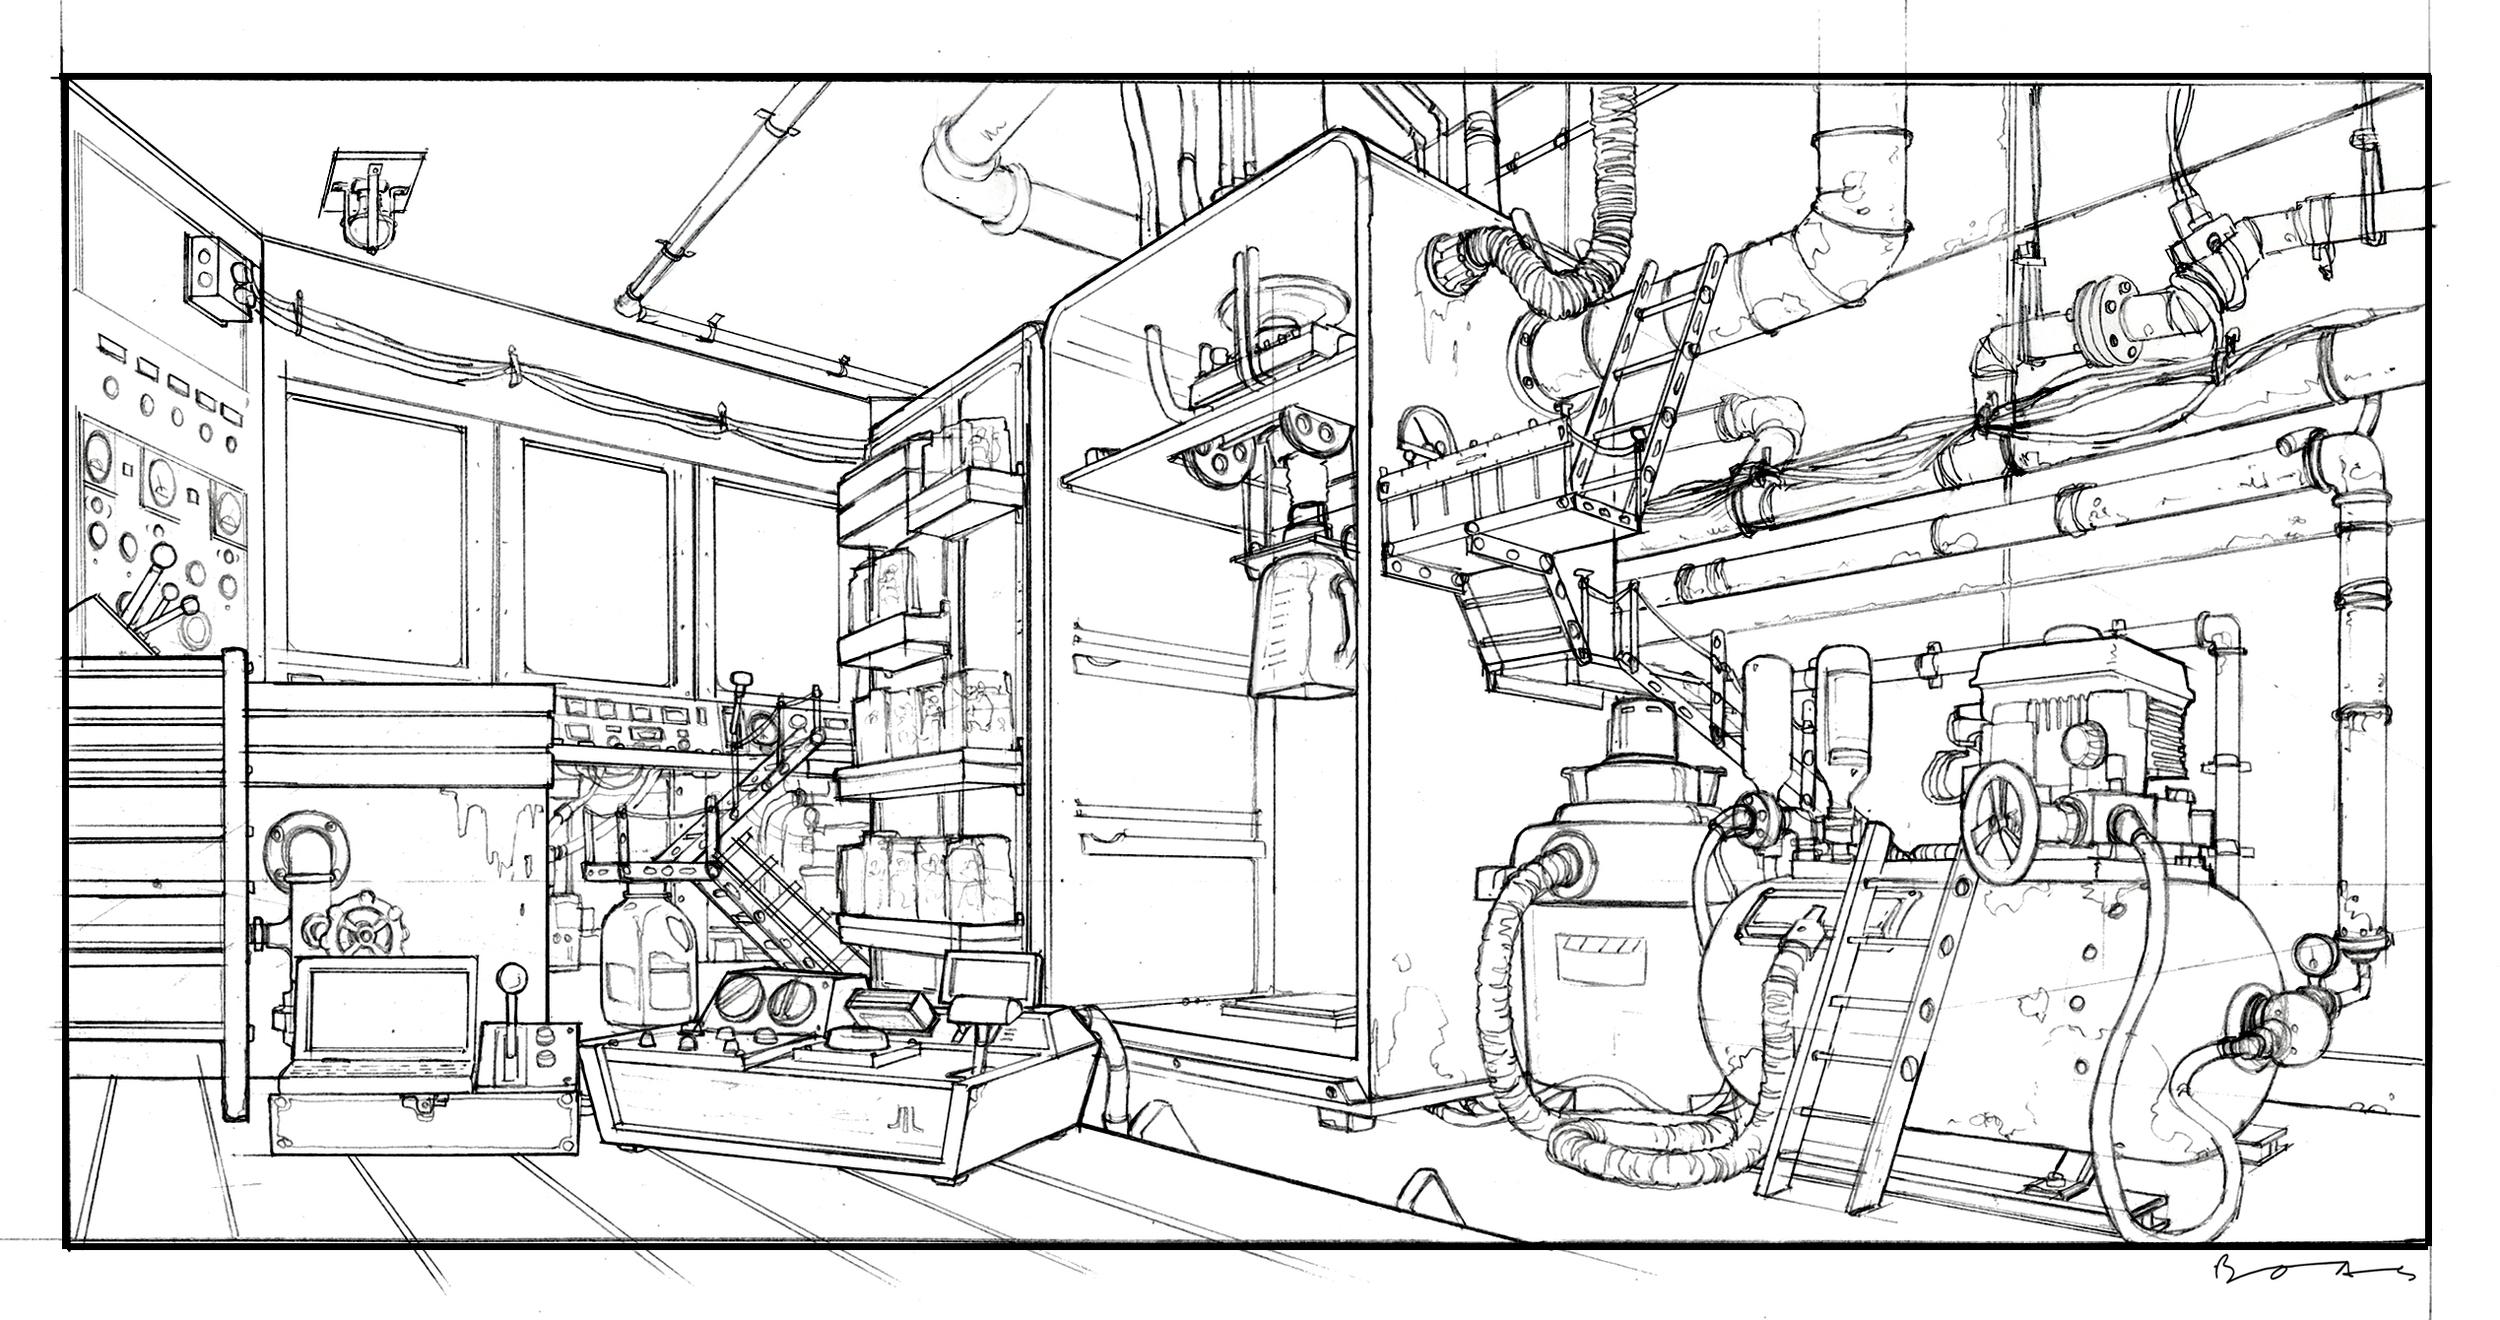 Flushed Away, DWA Control room design